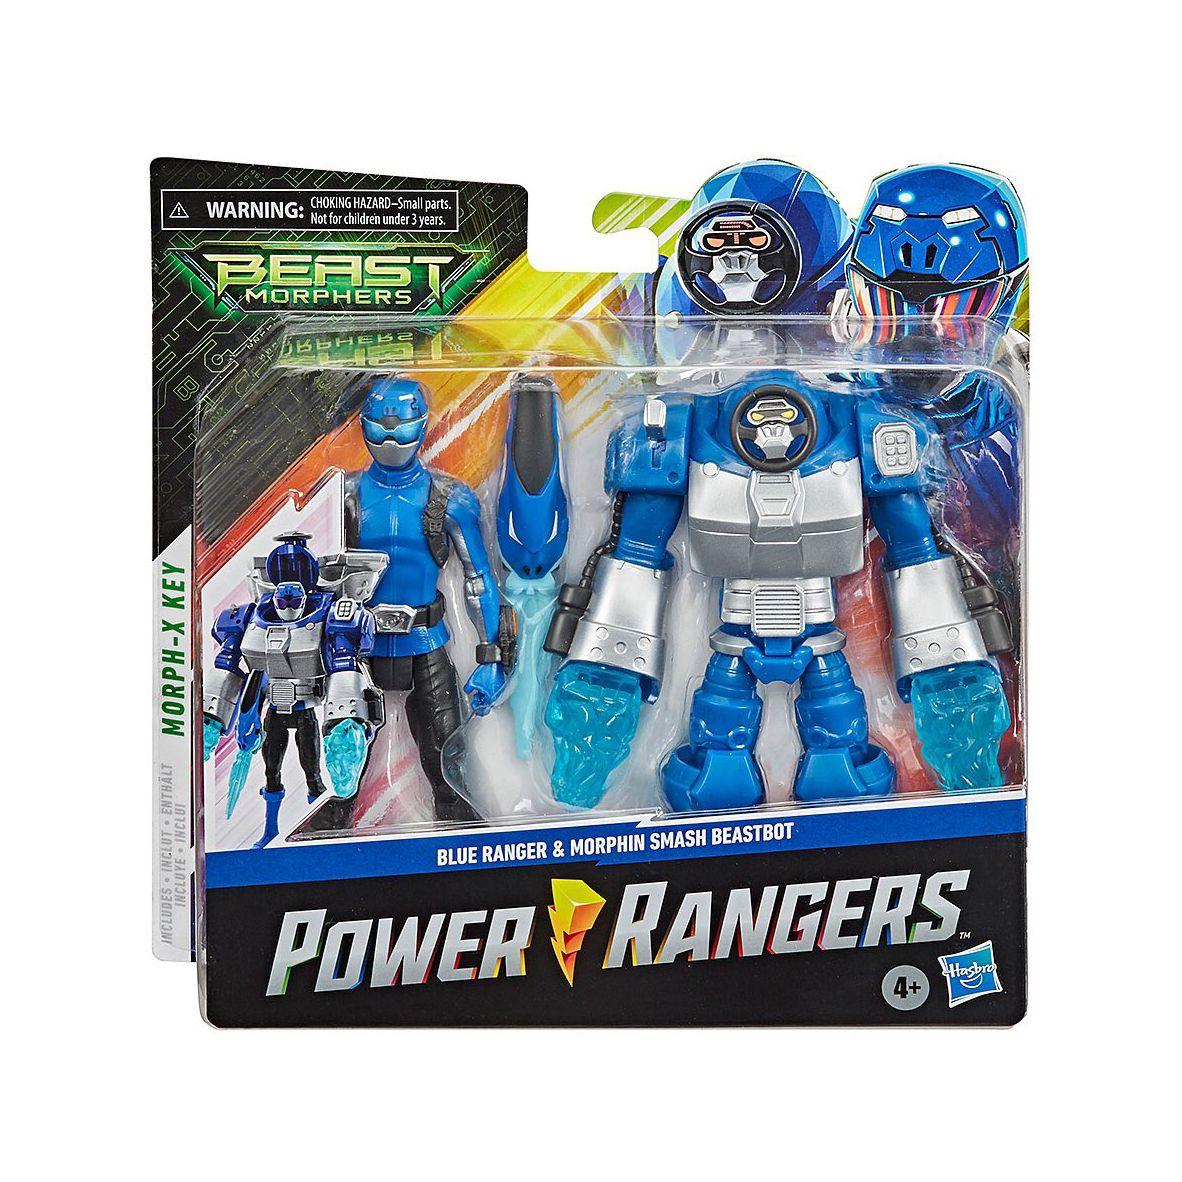 Boneco Power Rangers Blue Ranger e Beastbot - Hasbro